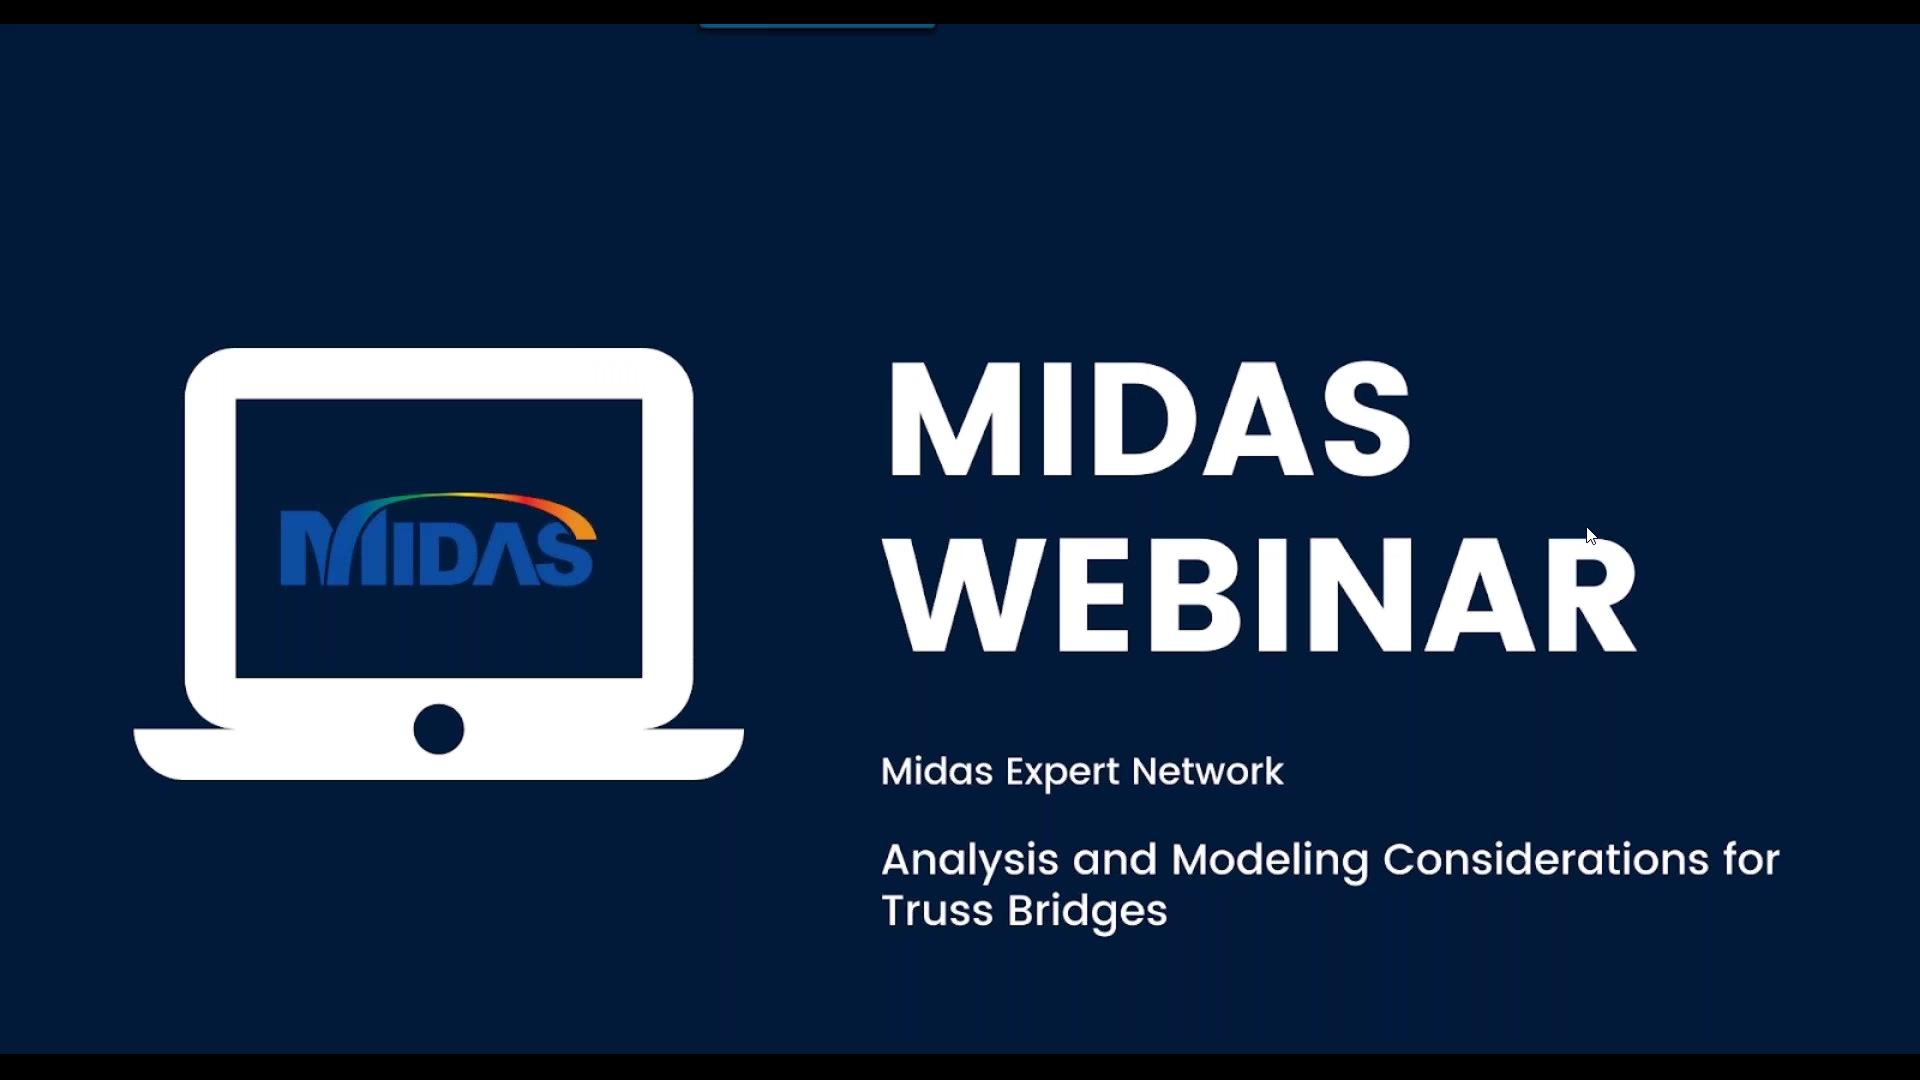 MIDAS Expert Webinar_ Analysis and Modeling Considerations for Truss Bridges